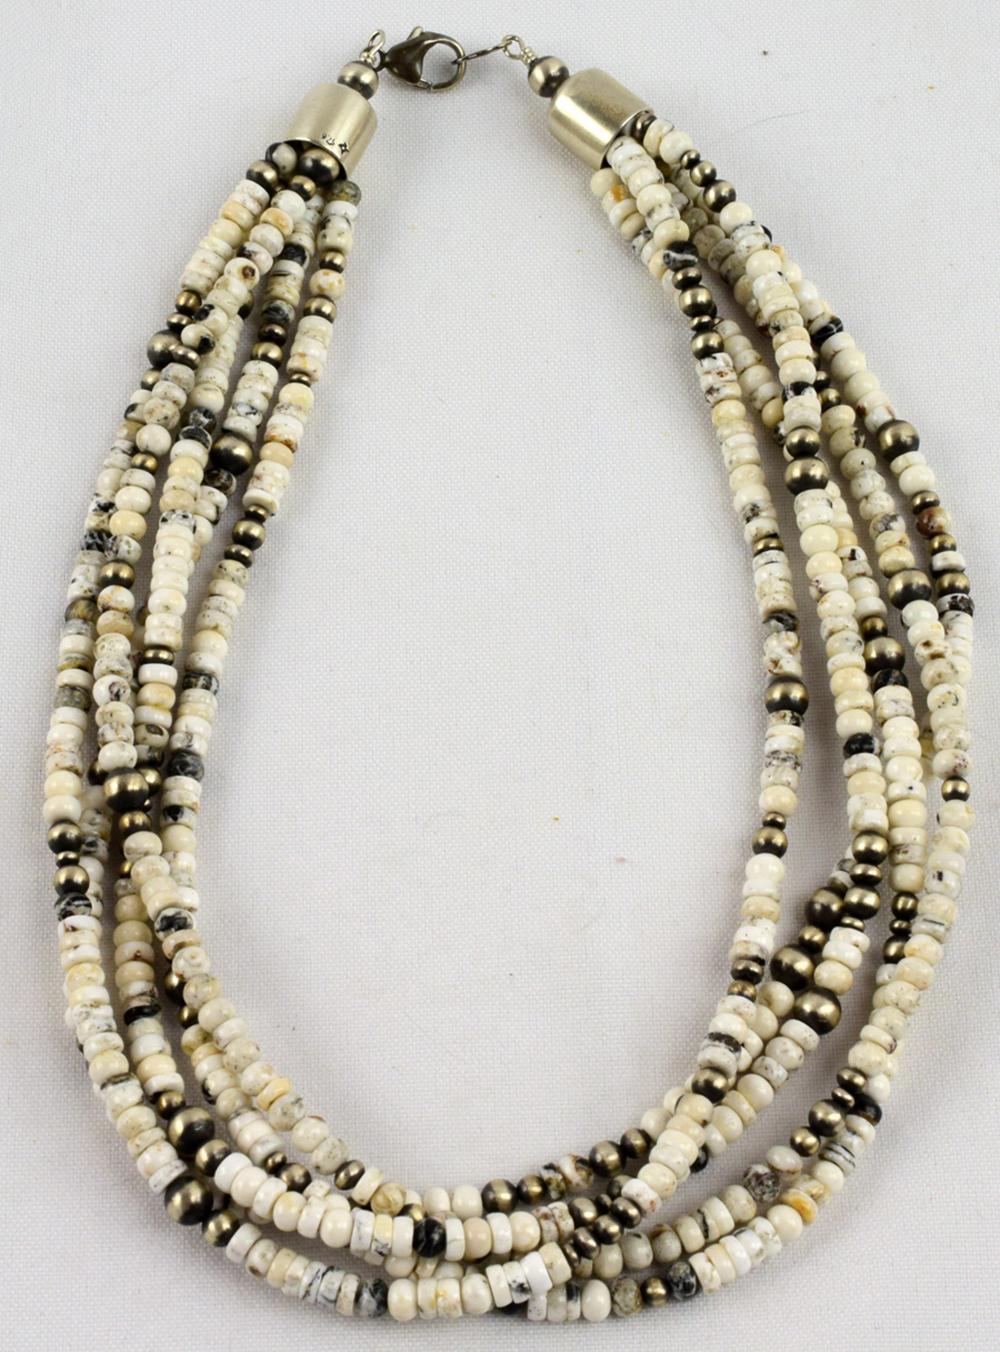 Native American 5 Strand White Buffalo Bead Necklace